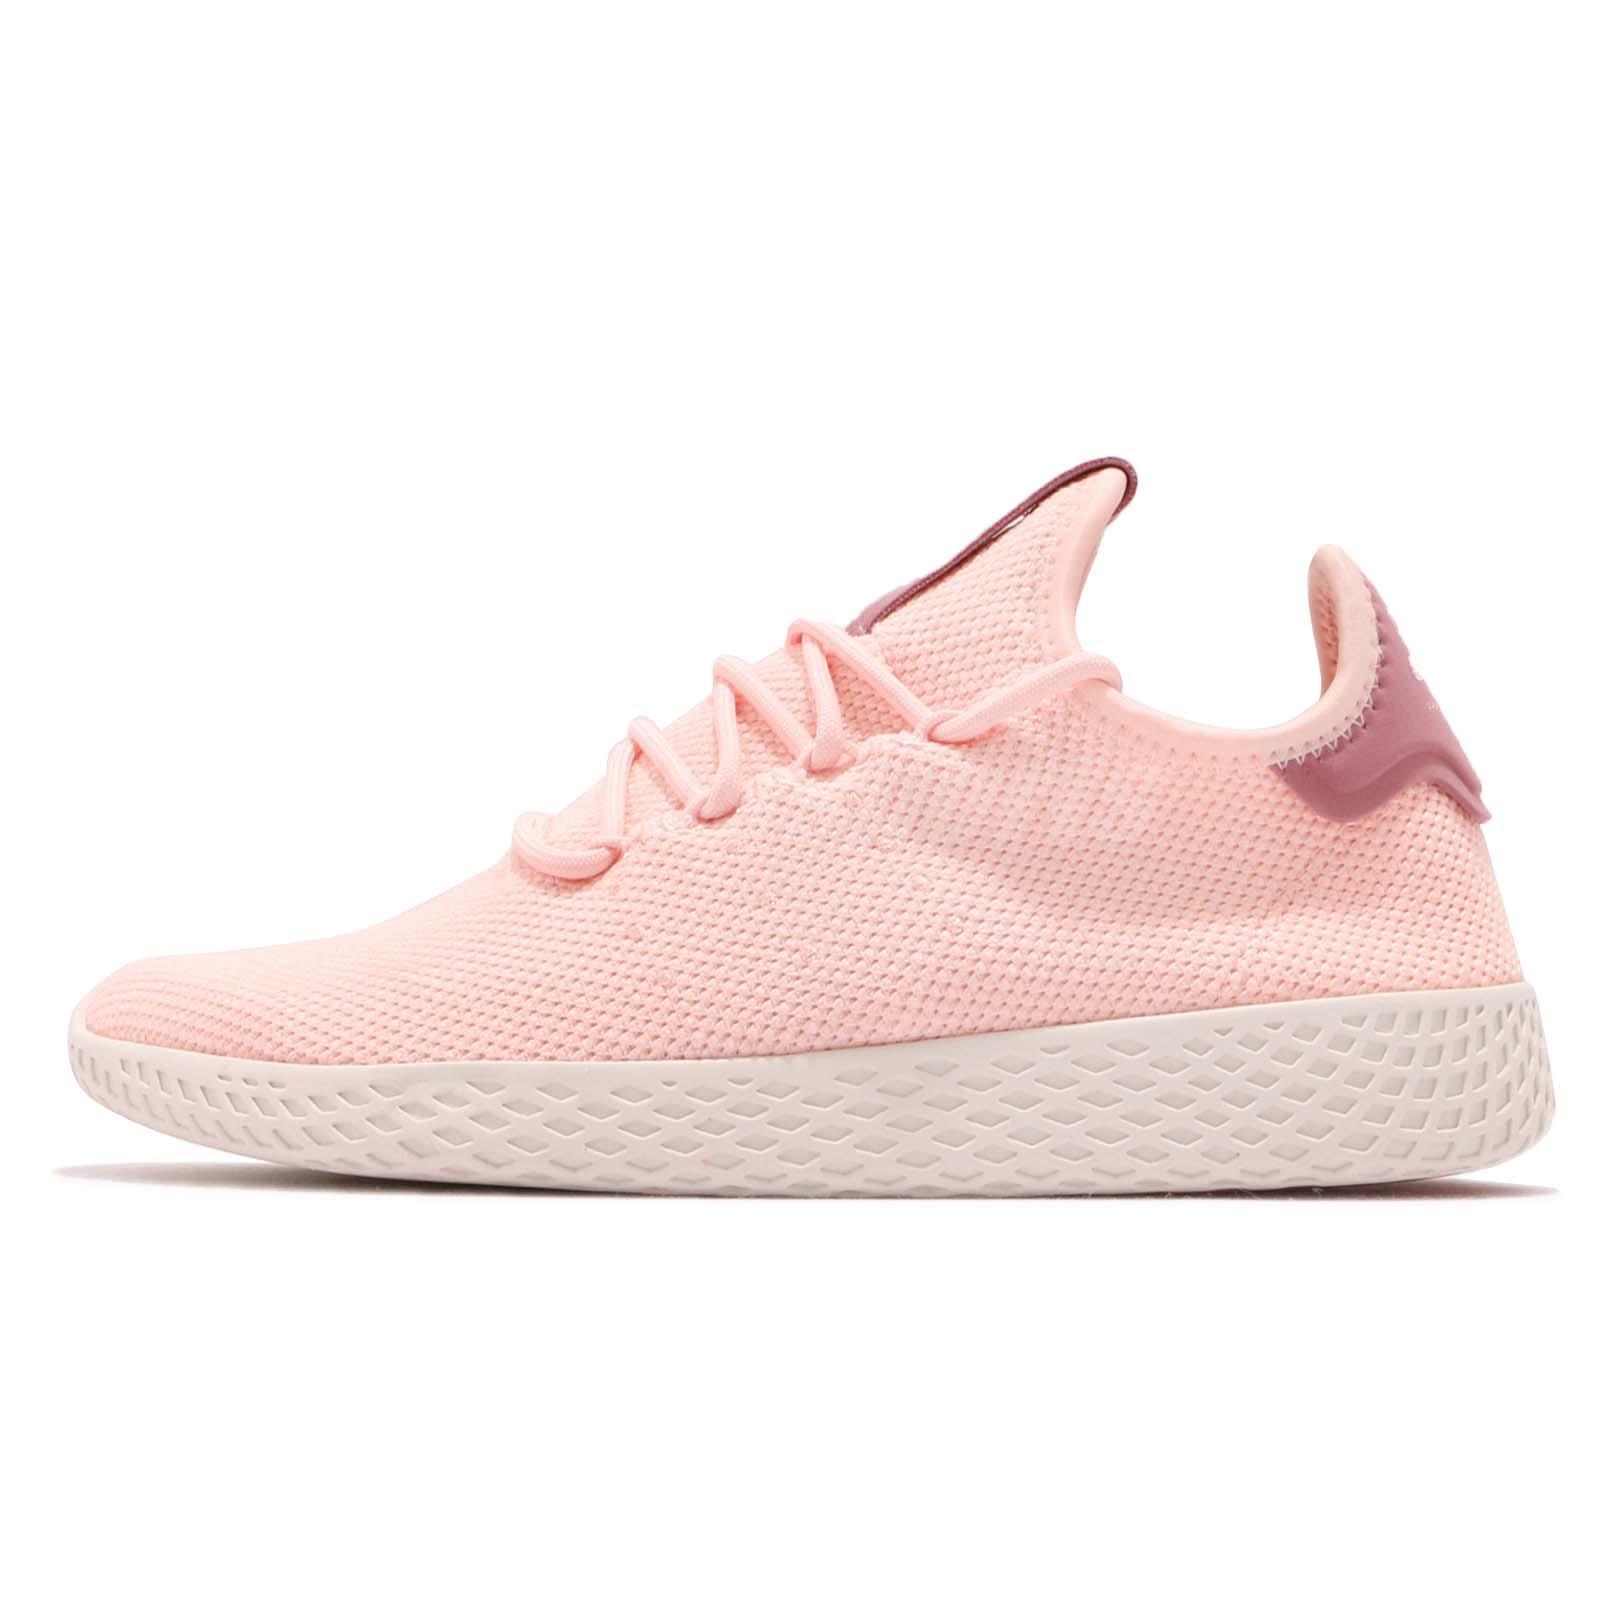 new arrival dad64 8a397 adidas Originals PW Tennis Hu W Pharrell Williams Pink Women Casual Shoes  AQ0988